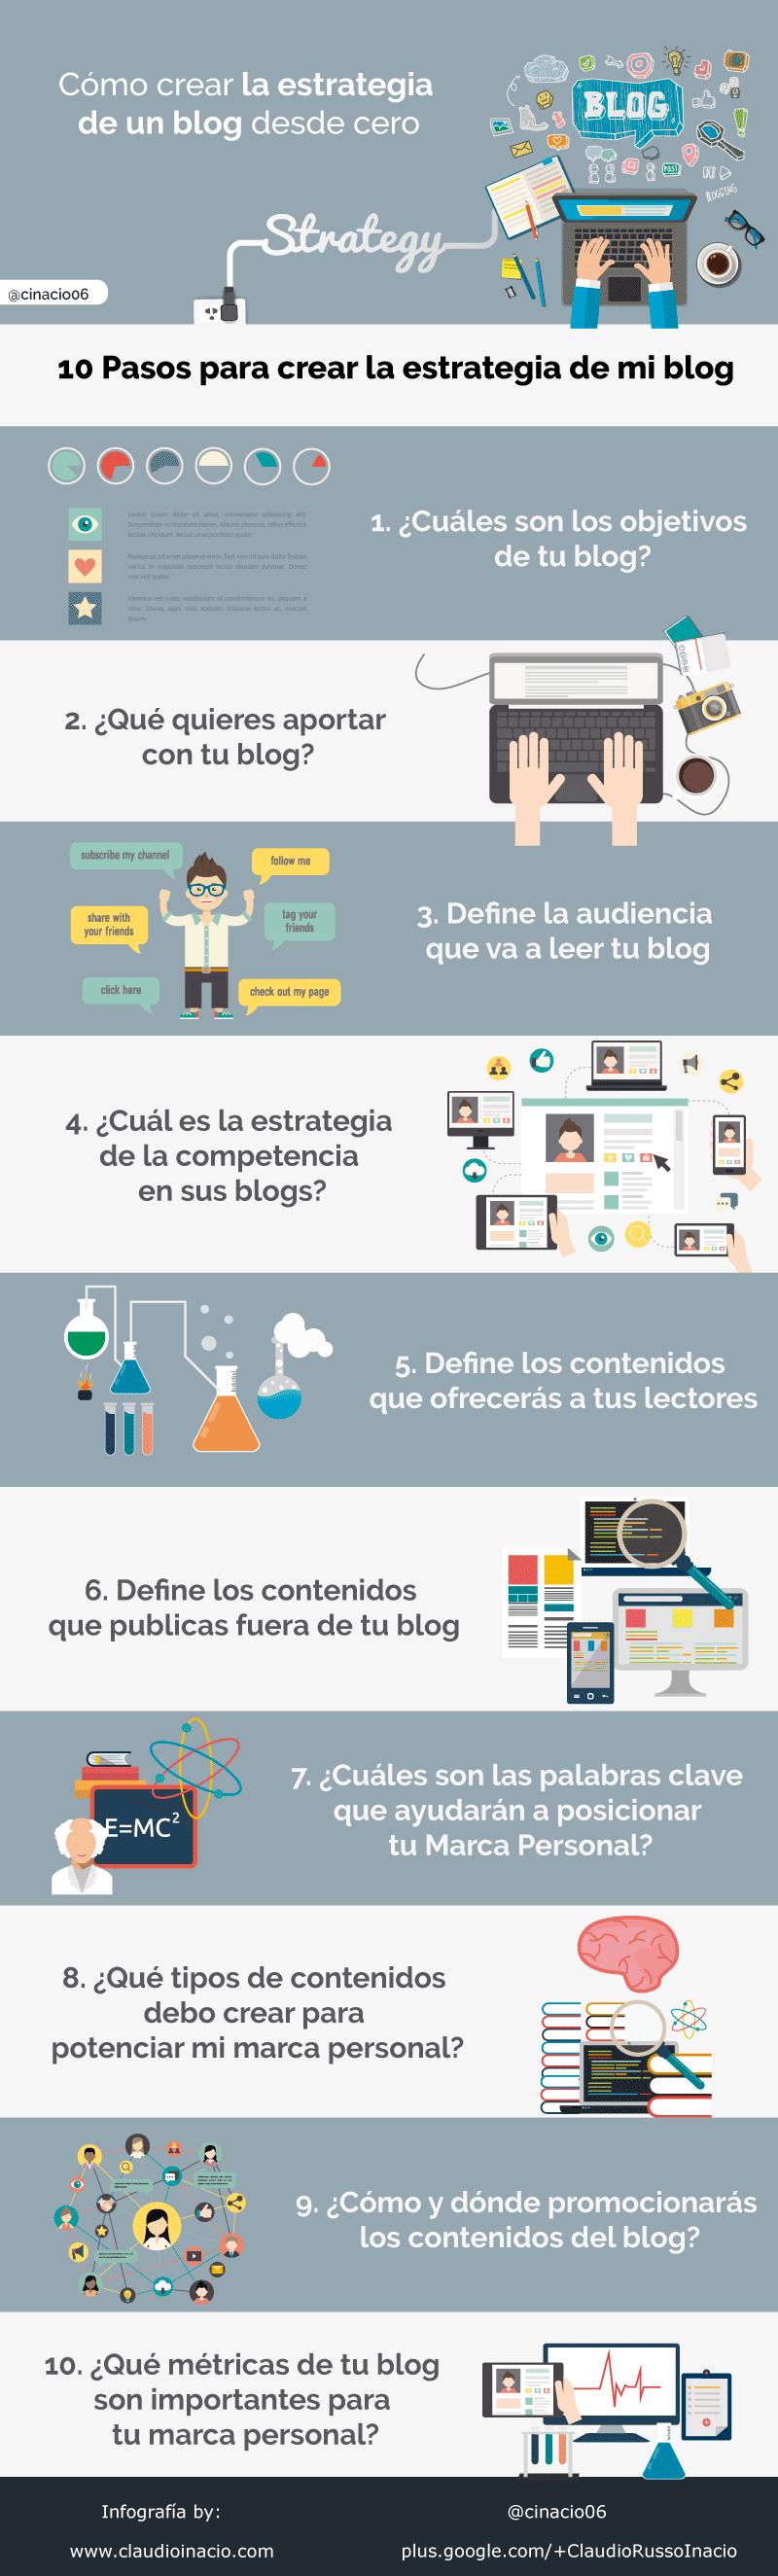 10 pasos para crear la estrategia de tu Blog #infografia #infographic #socialmedia